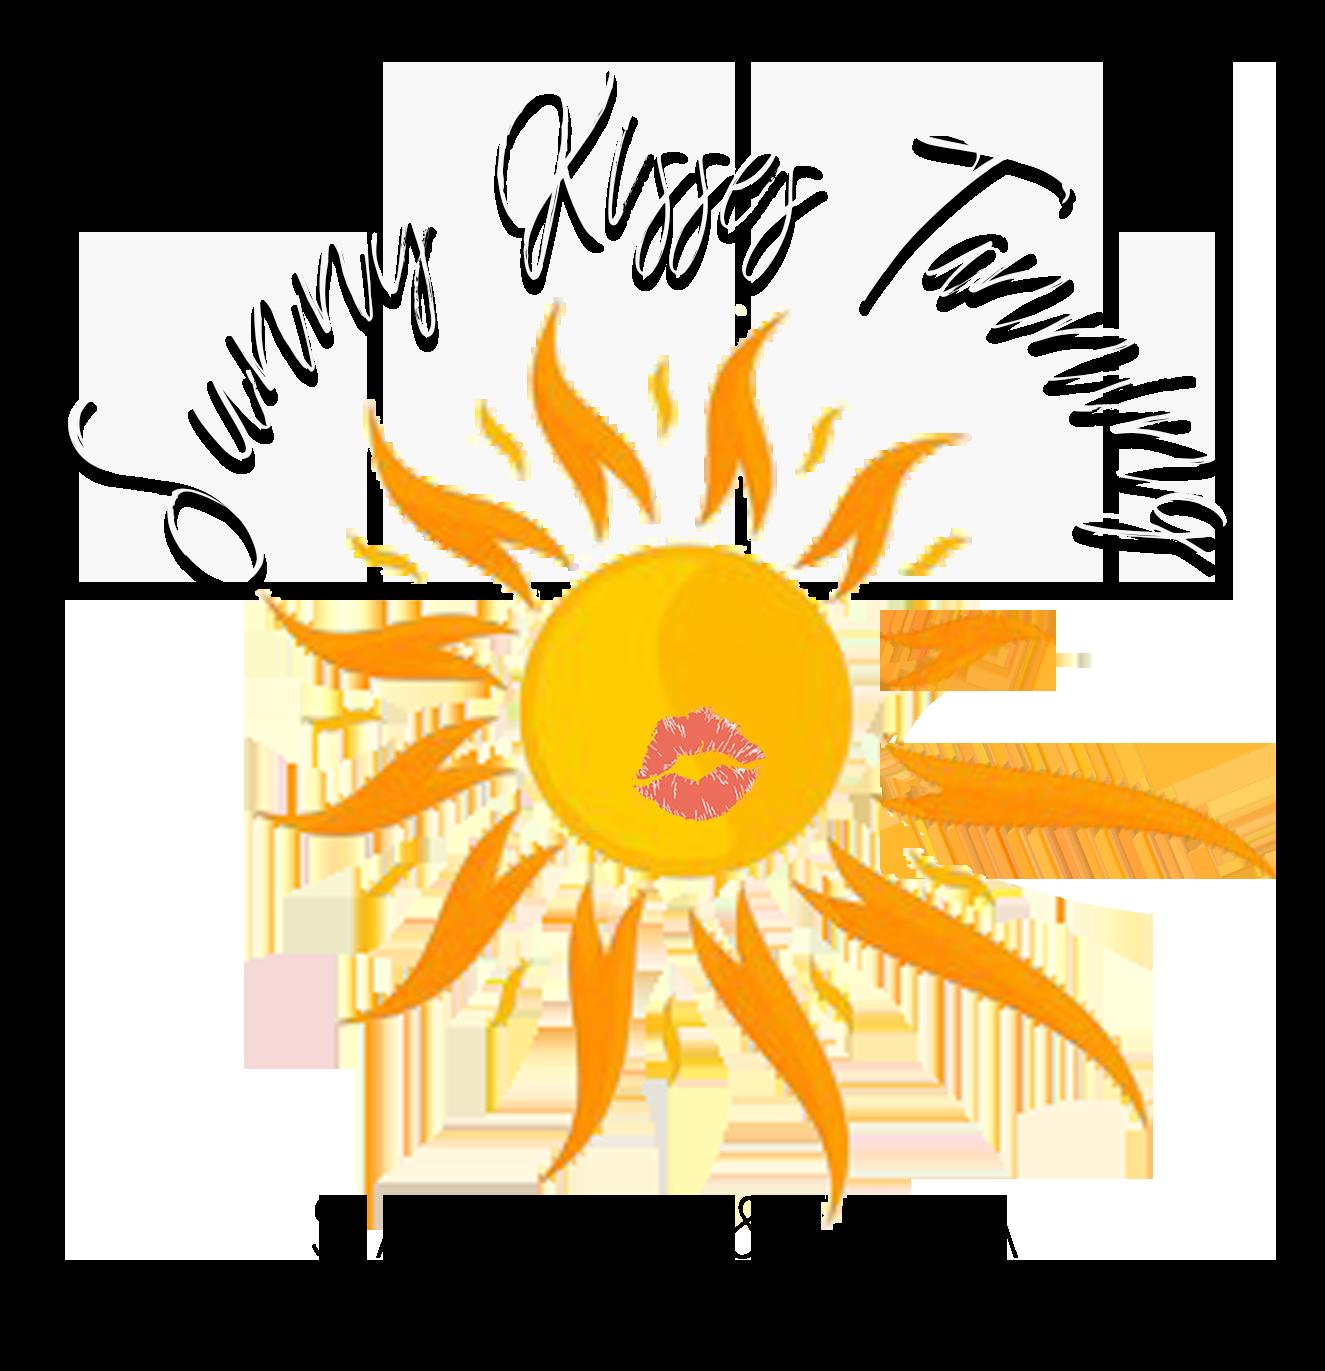 Sunny Kisses Tanning Salon & Spa